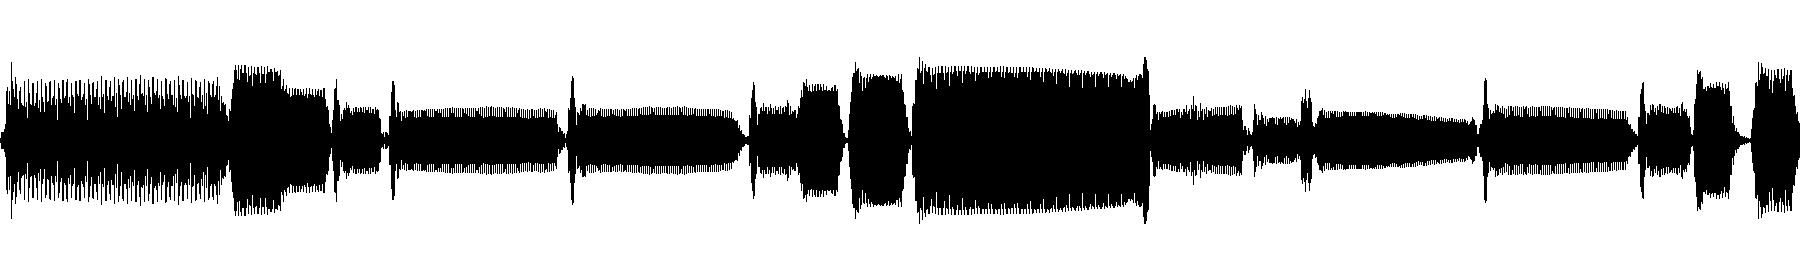 blbc jazzyripper 75 c